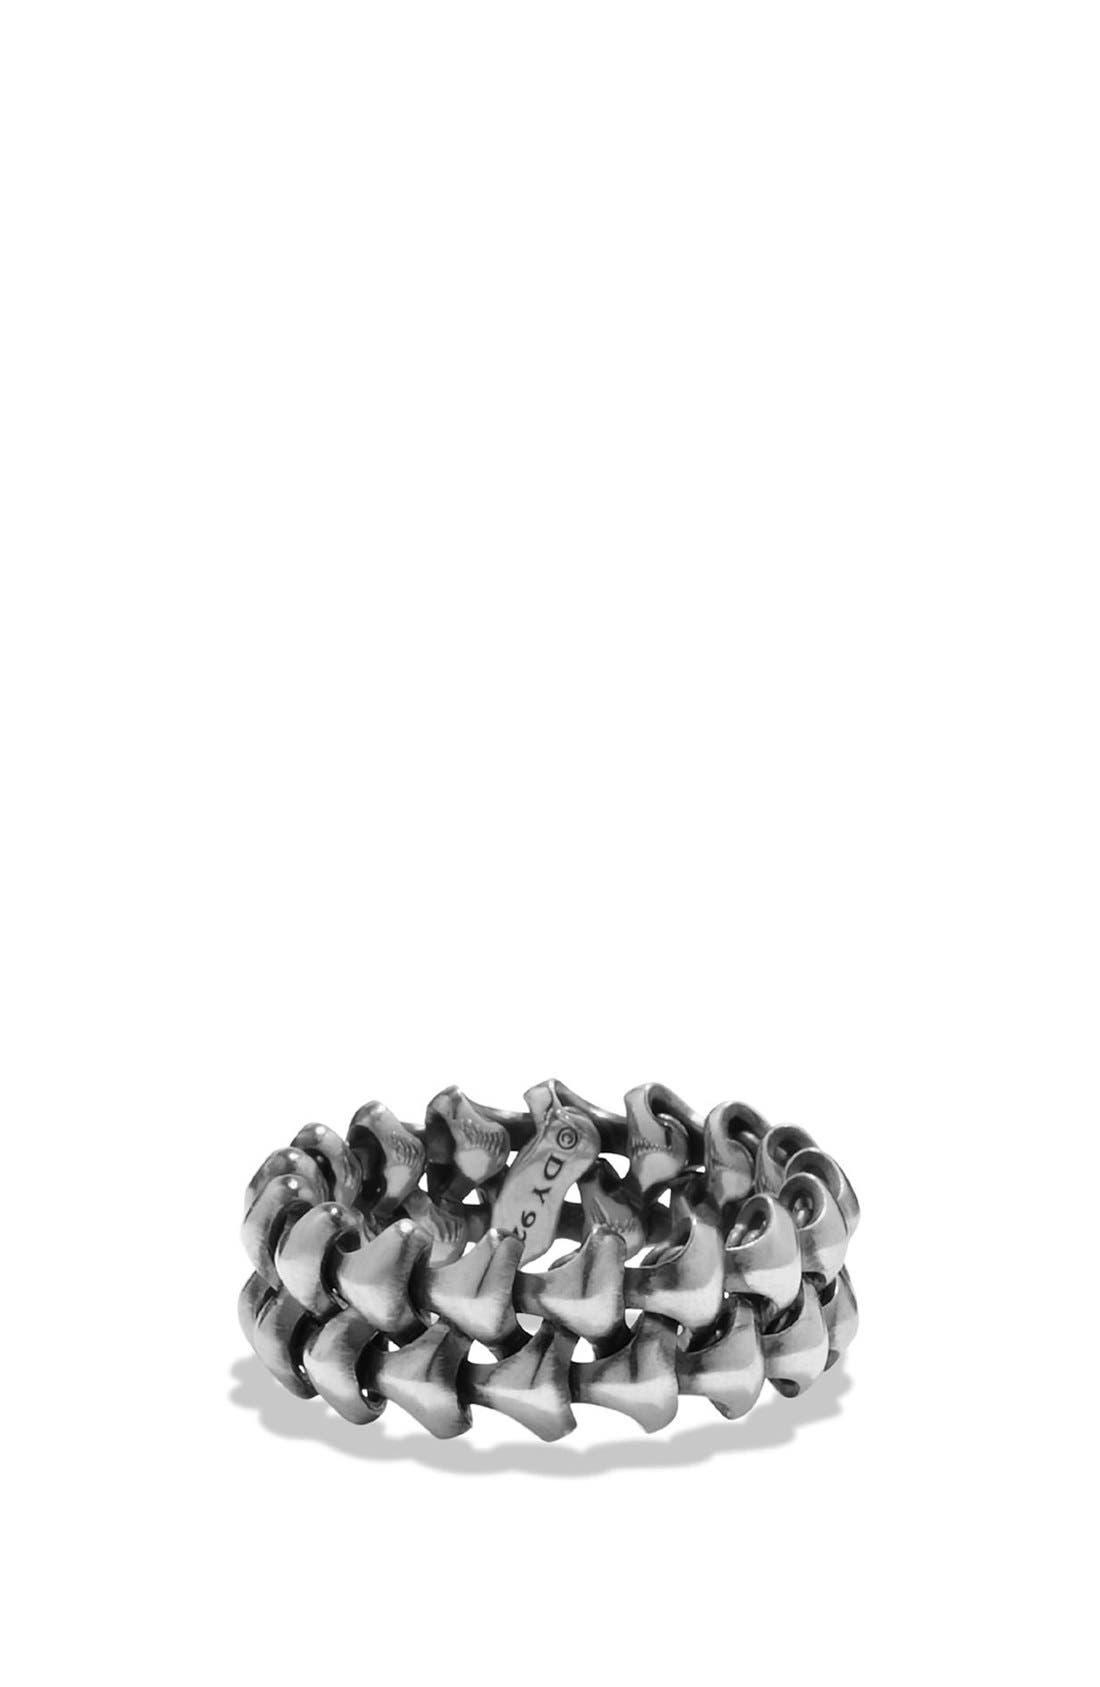 Alternate Image 1 Selected - David Yurman 'Armory' Band Ring